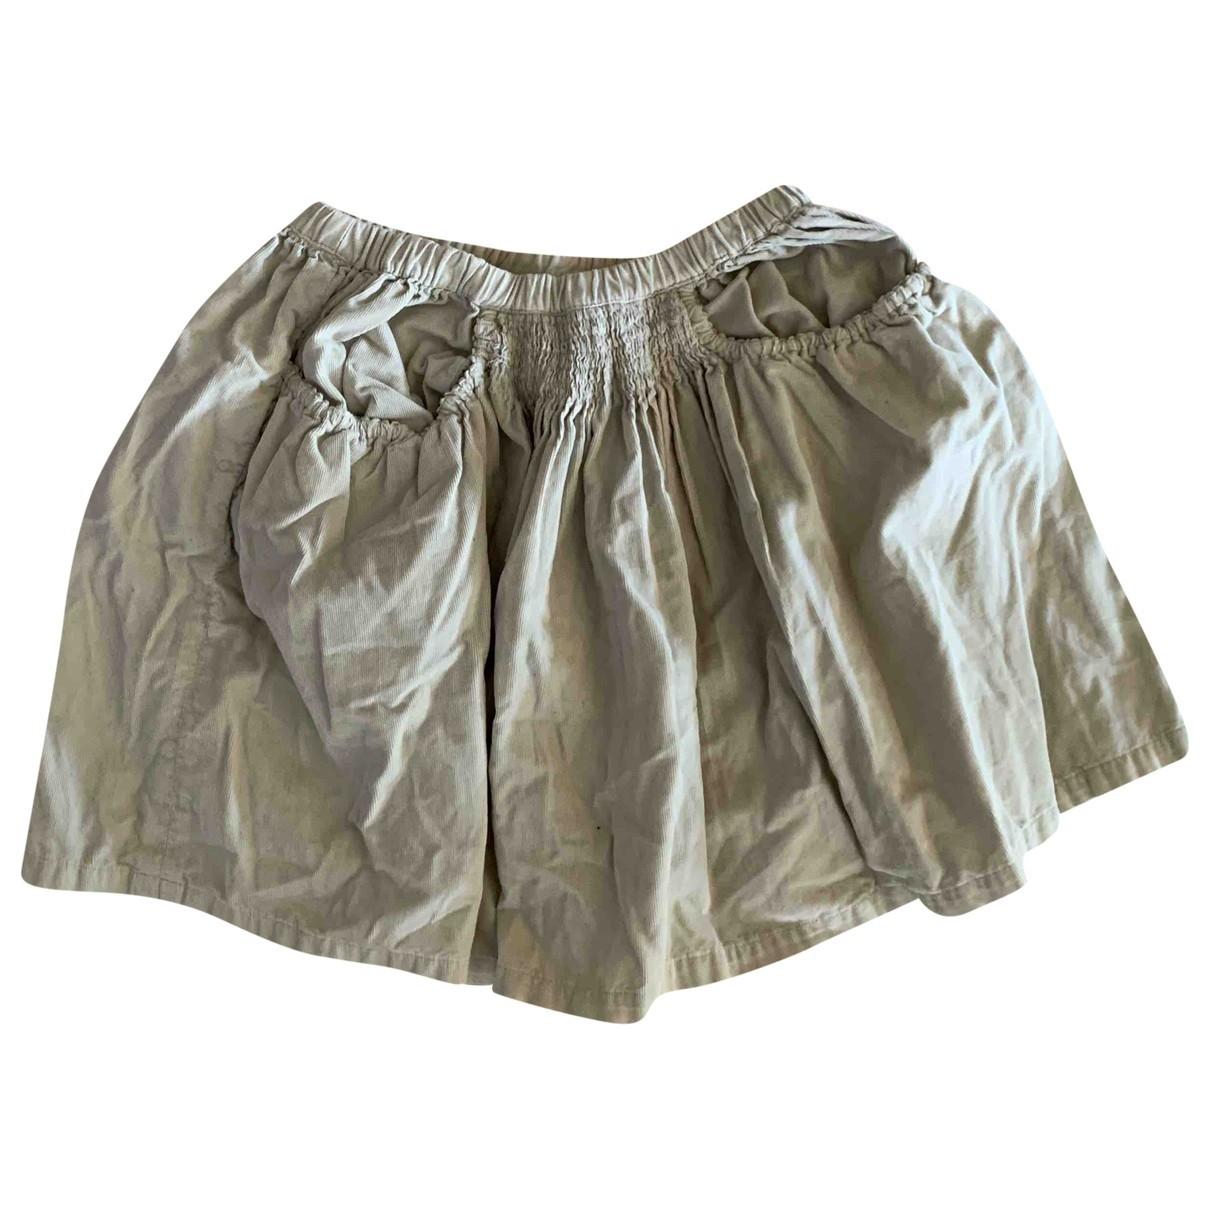 Bonton \N Beige Cotton skirt for Kids 10 years - up to 142cm FR